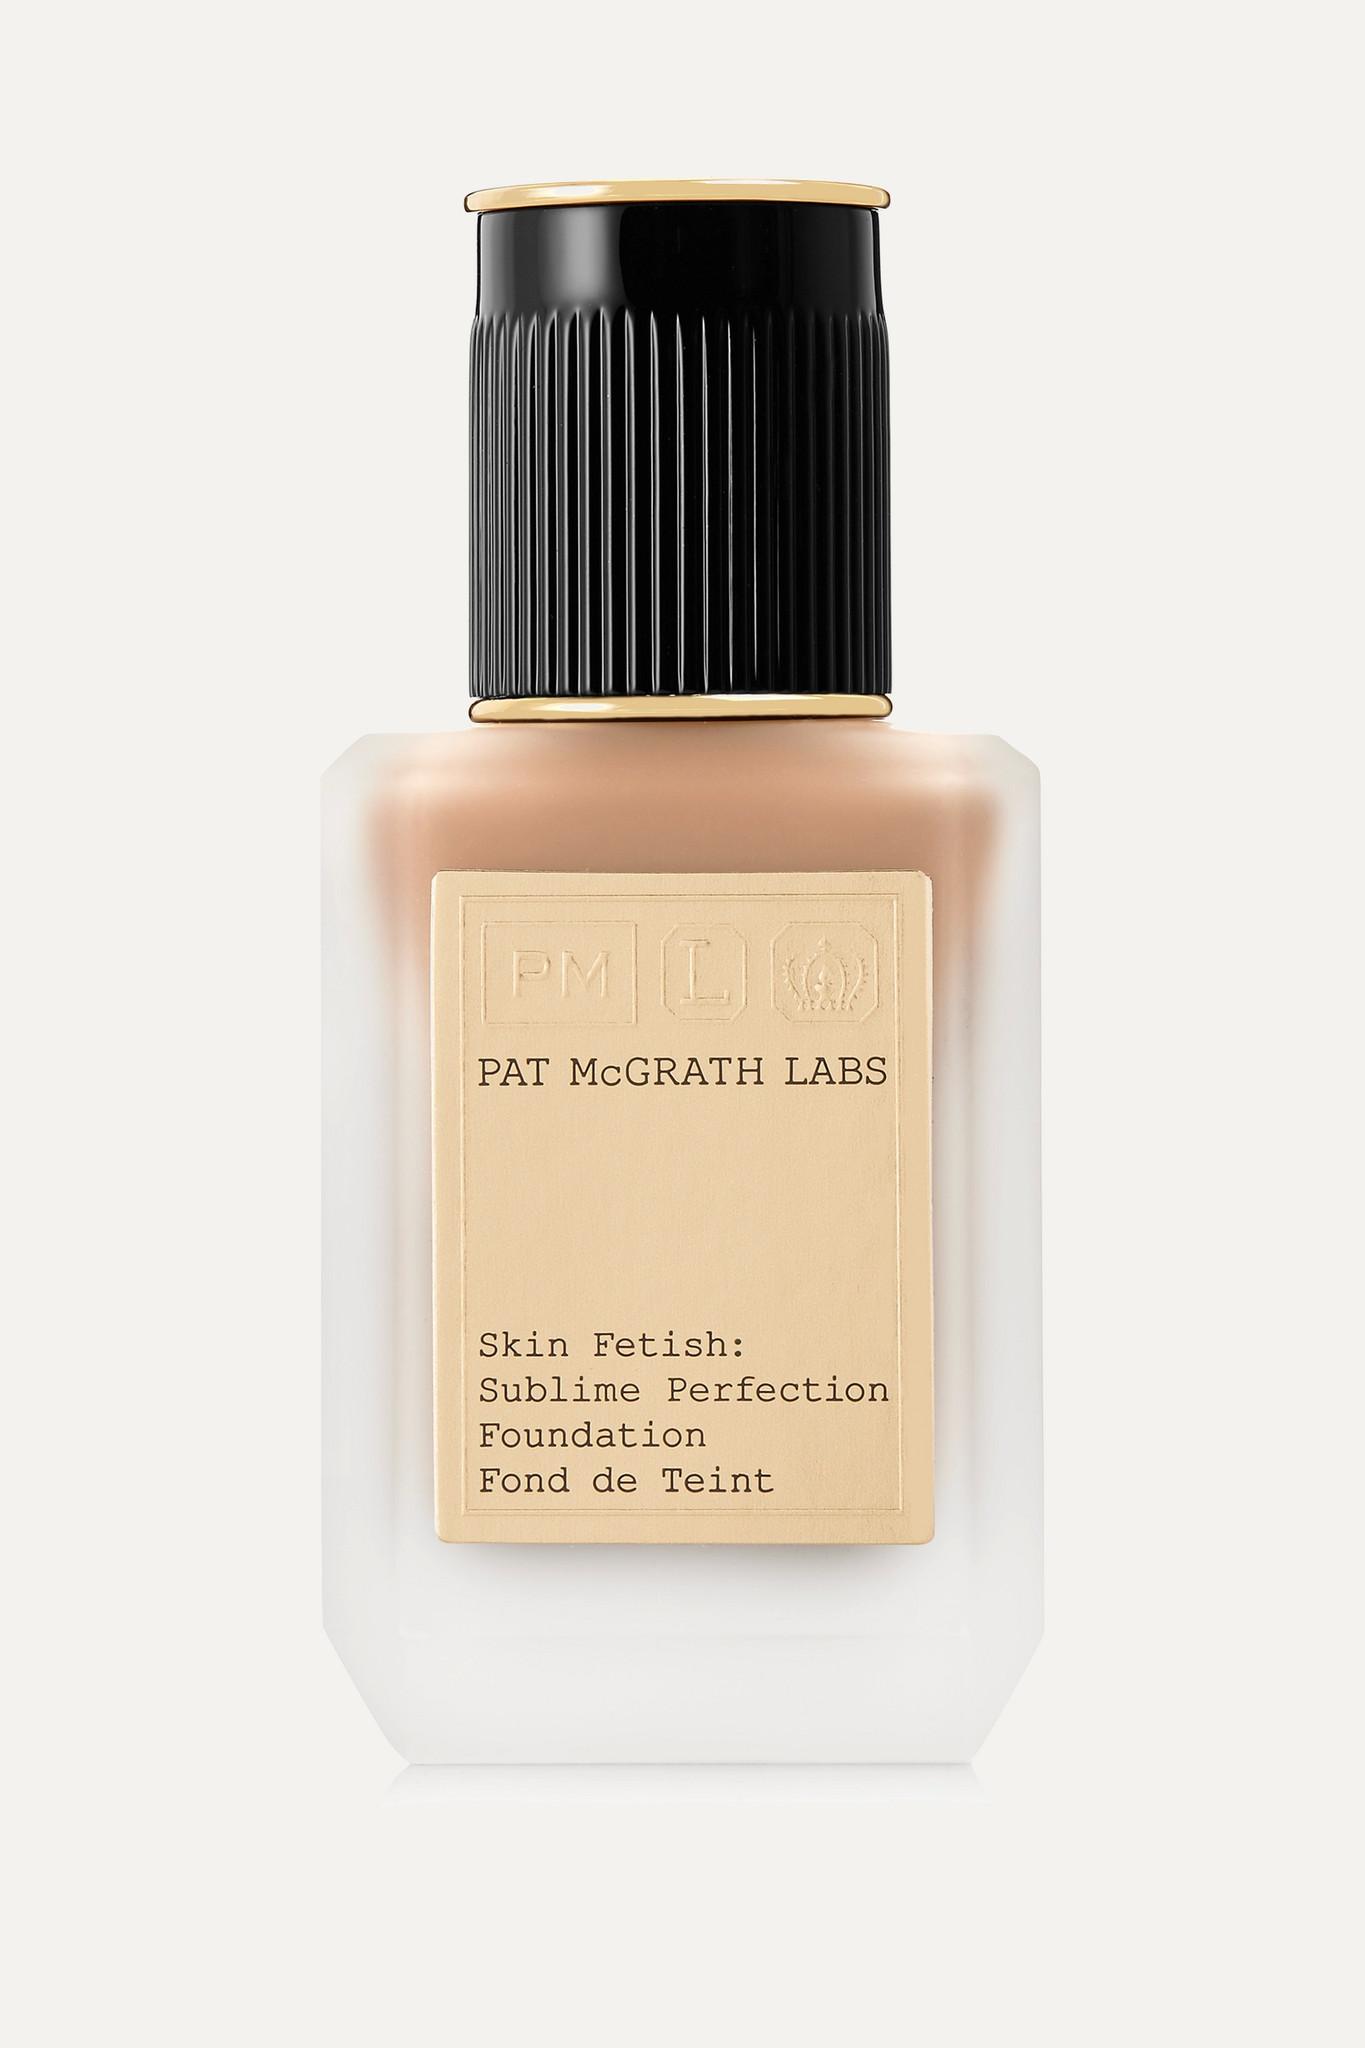 PAT MCGRATH LABS - Skin Fetish: Sublime Perfection Foundation - Medium 16, 35ml - Neutrals - one siz